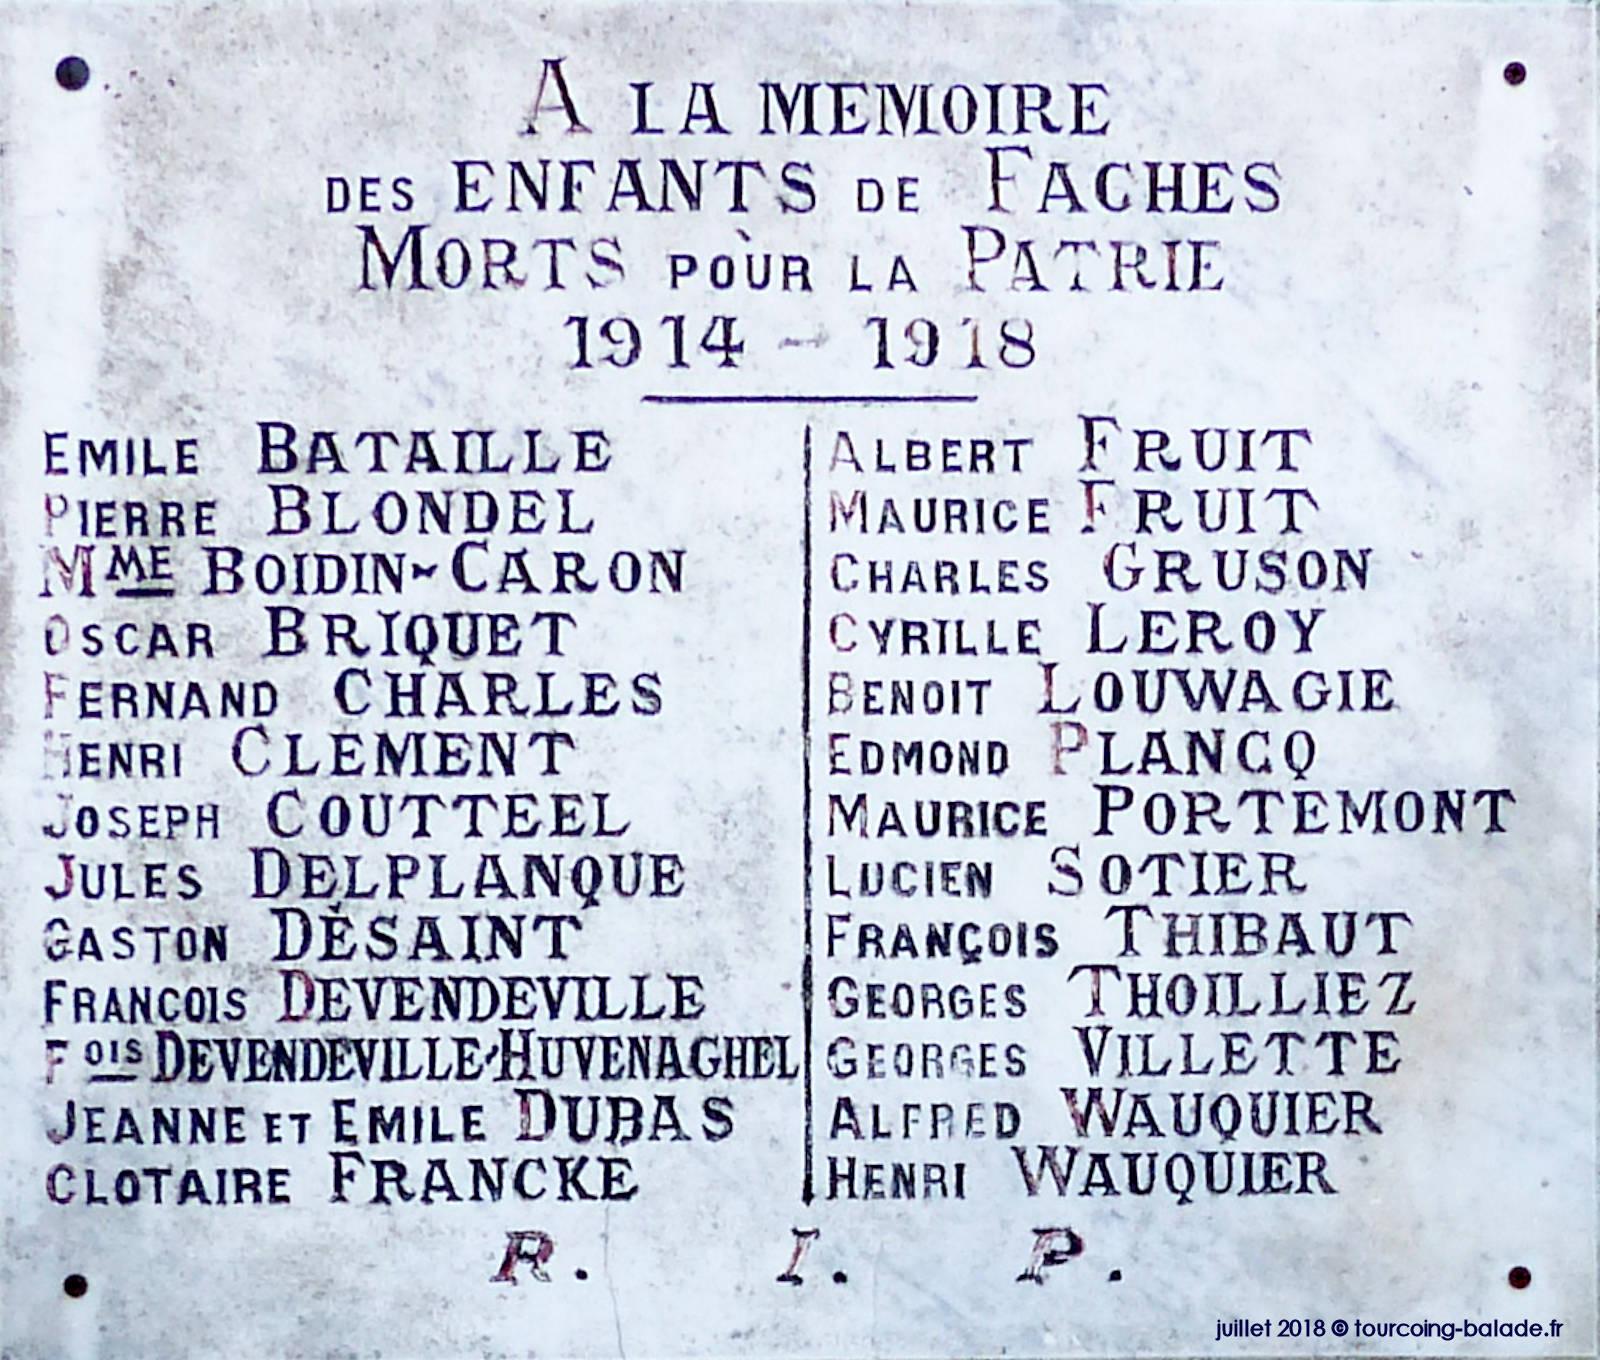 Monument Stèle Morts Faches 14-18